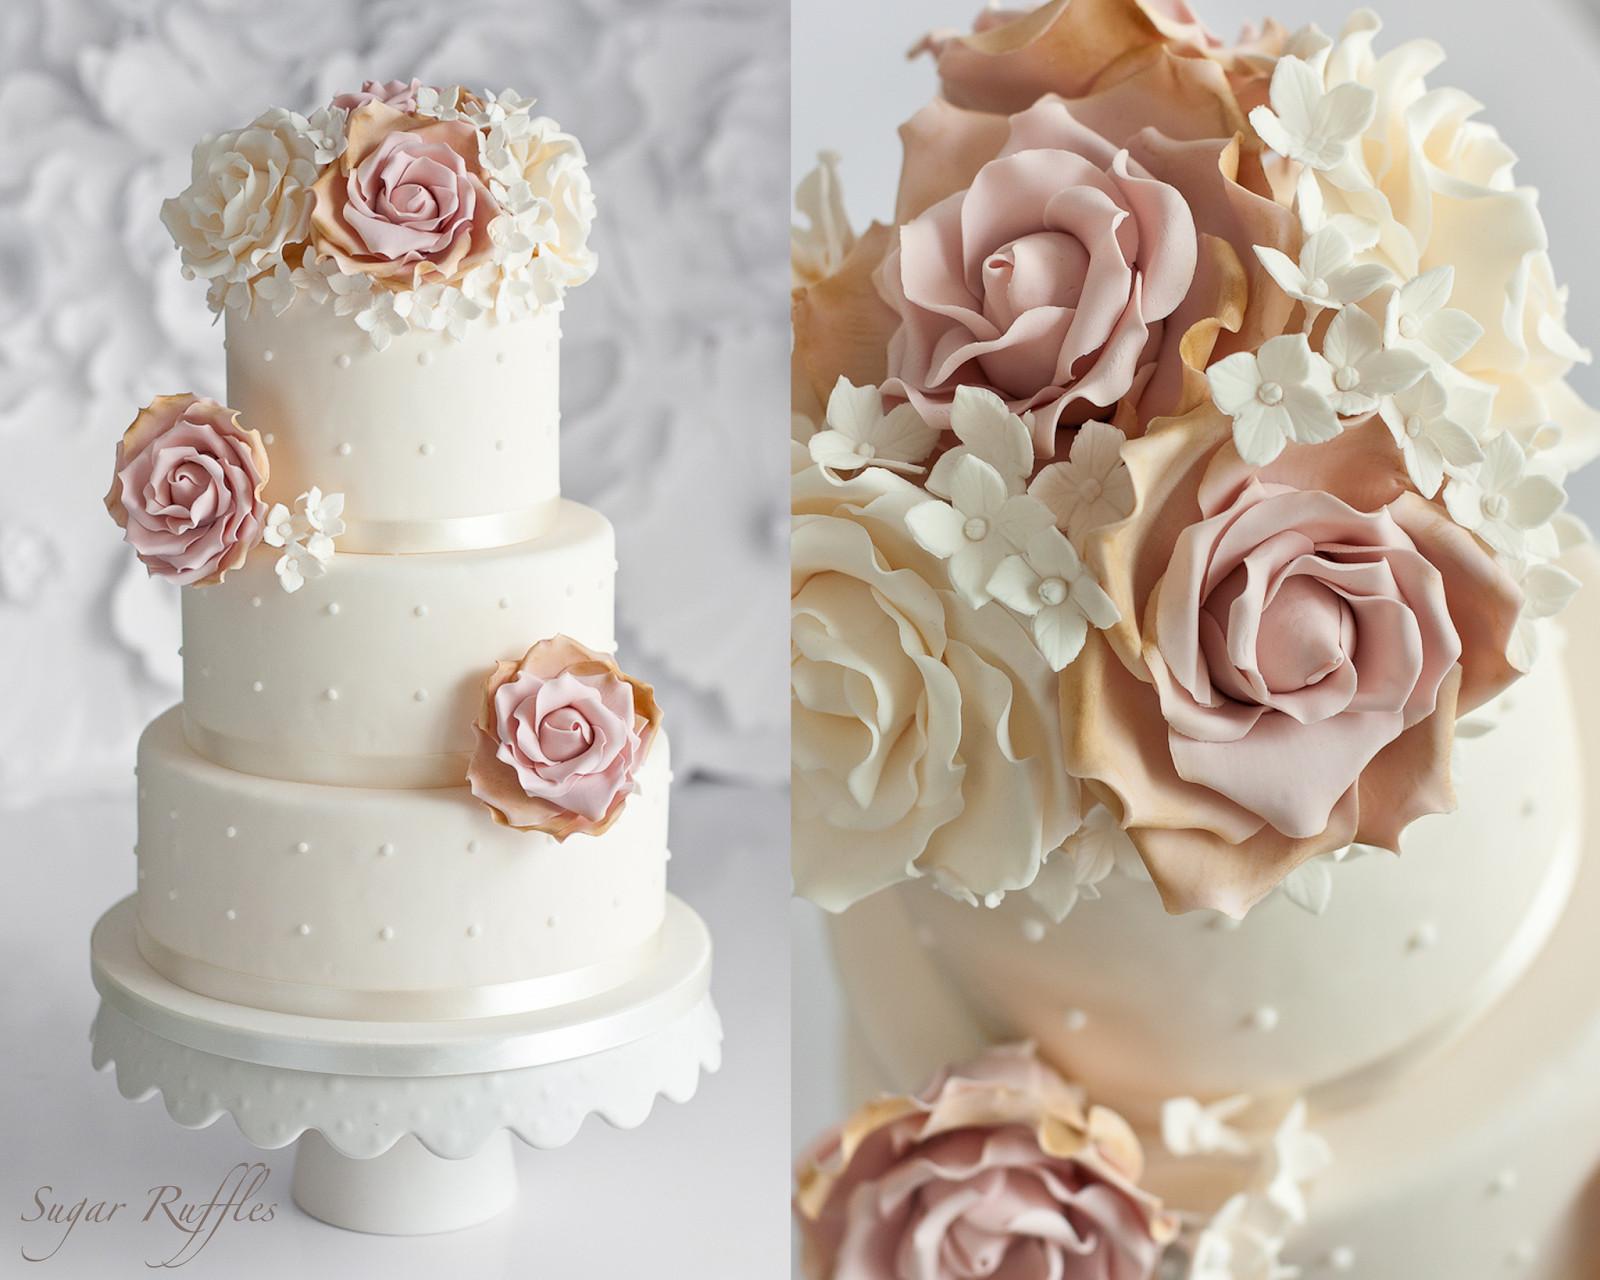 Wedding Cakes With Roses  Sugar Ruffles Elegant Wedding Cakes Barrow in Furness